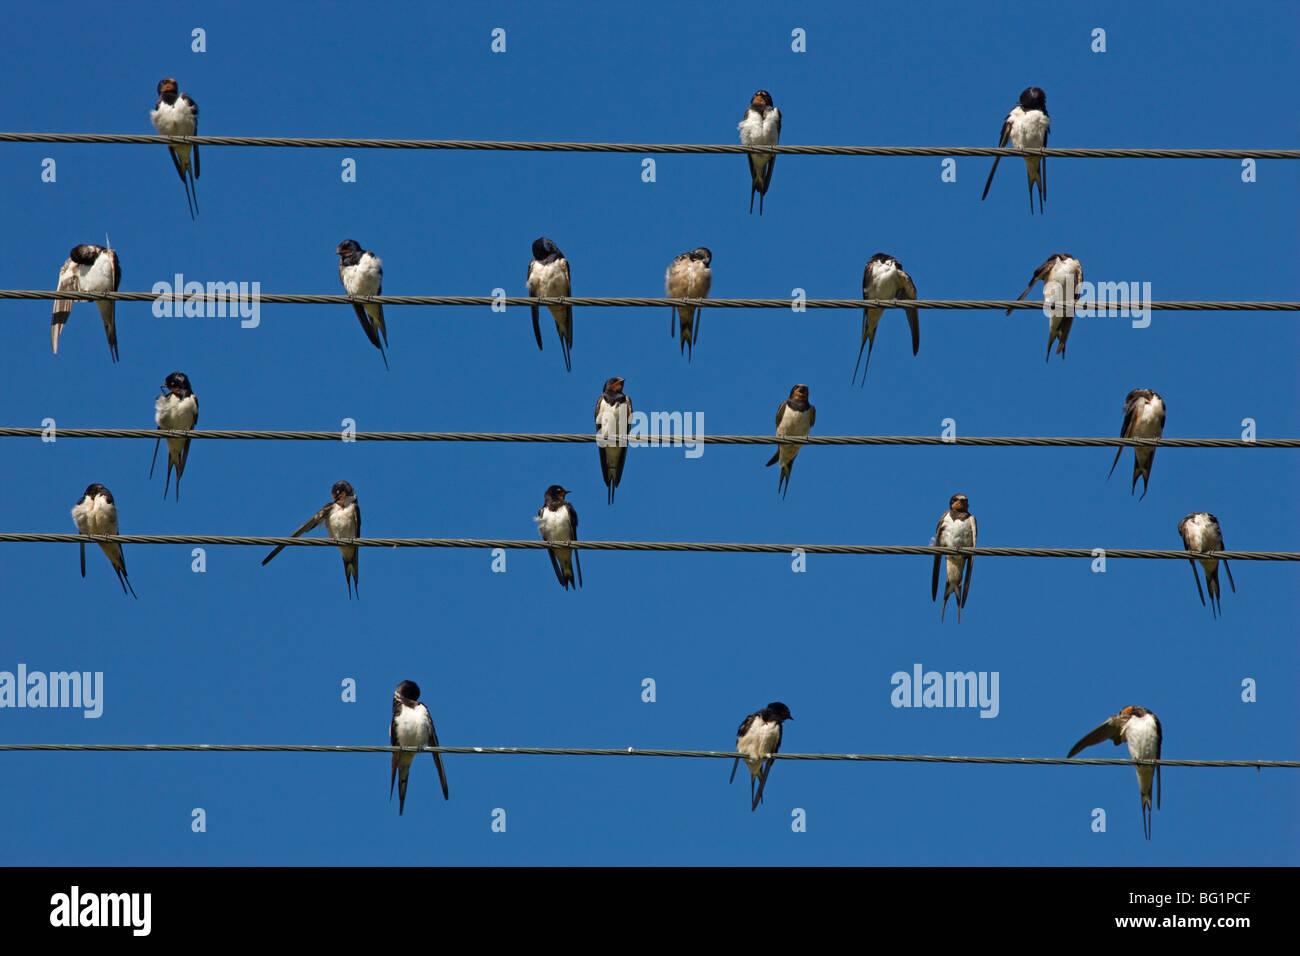 Fienile (europeo) swallow (Hirundo rustica) sul filo, Overberg, Western Cape, Sud Africa e Africa Immagini Stock